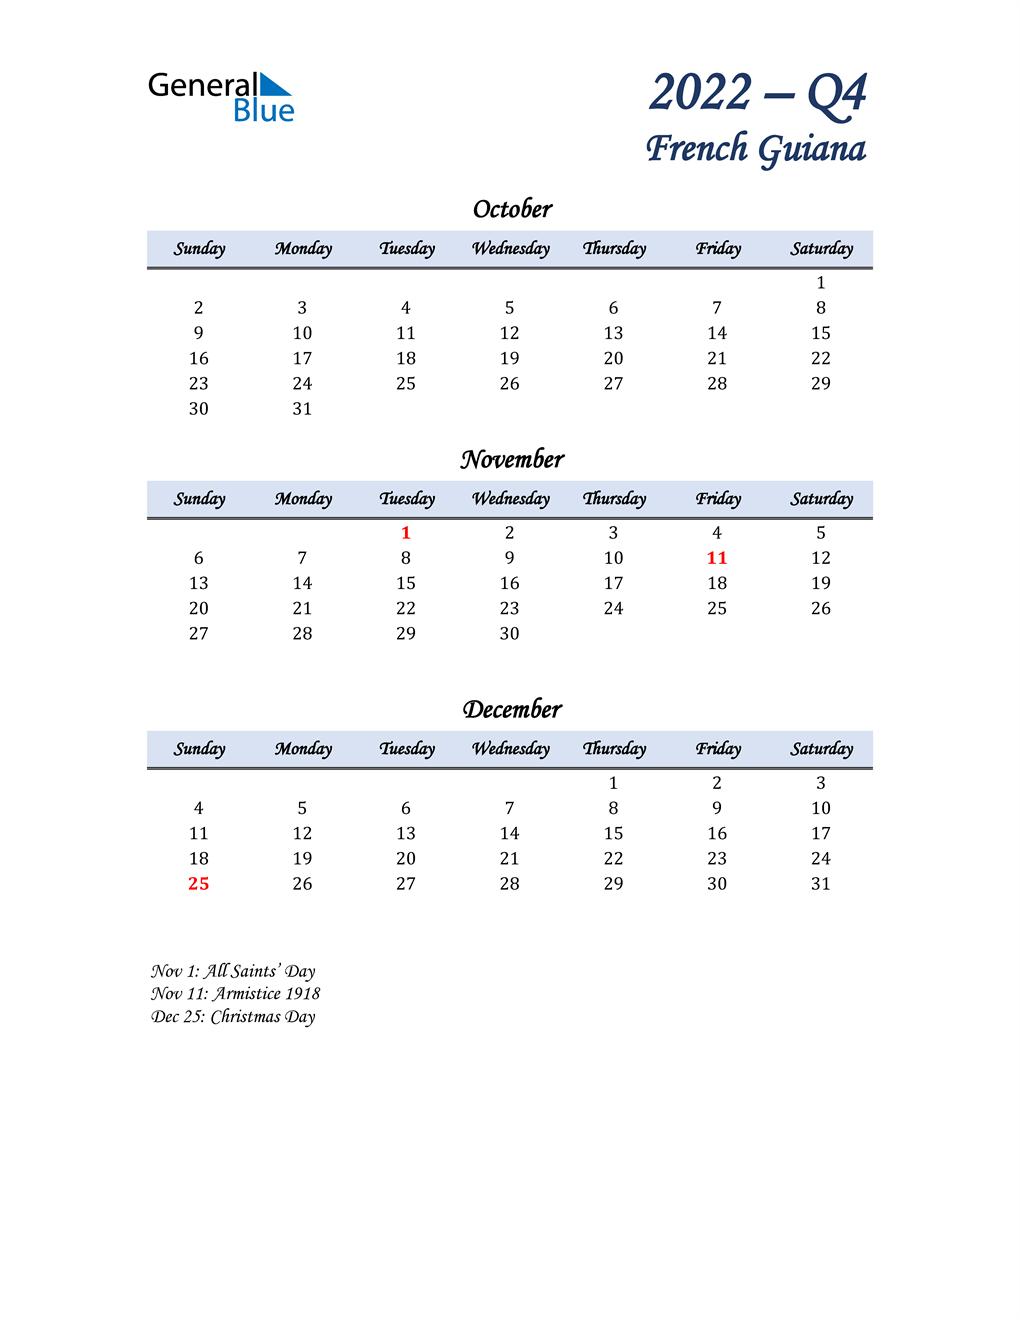 October, November, and December Calendar for French Guiana